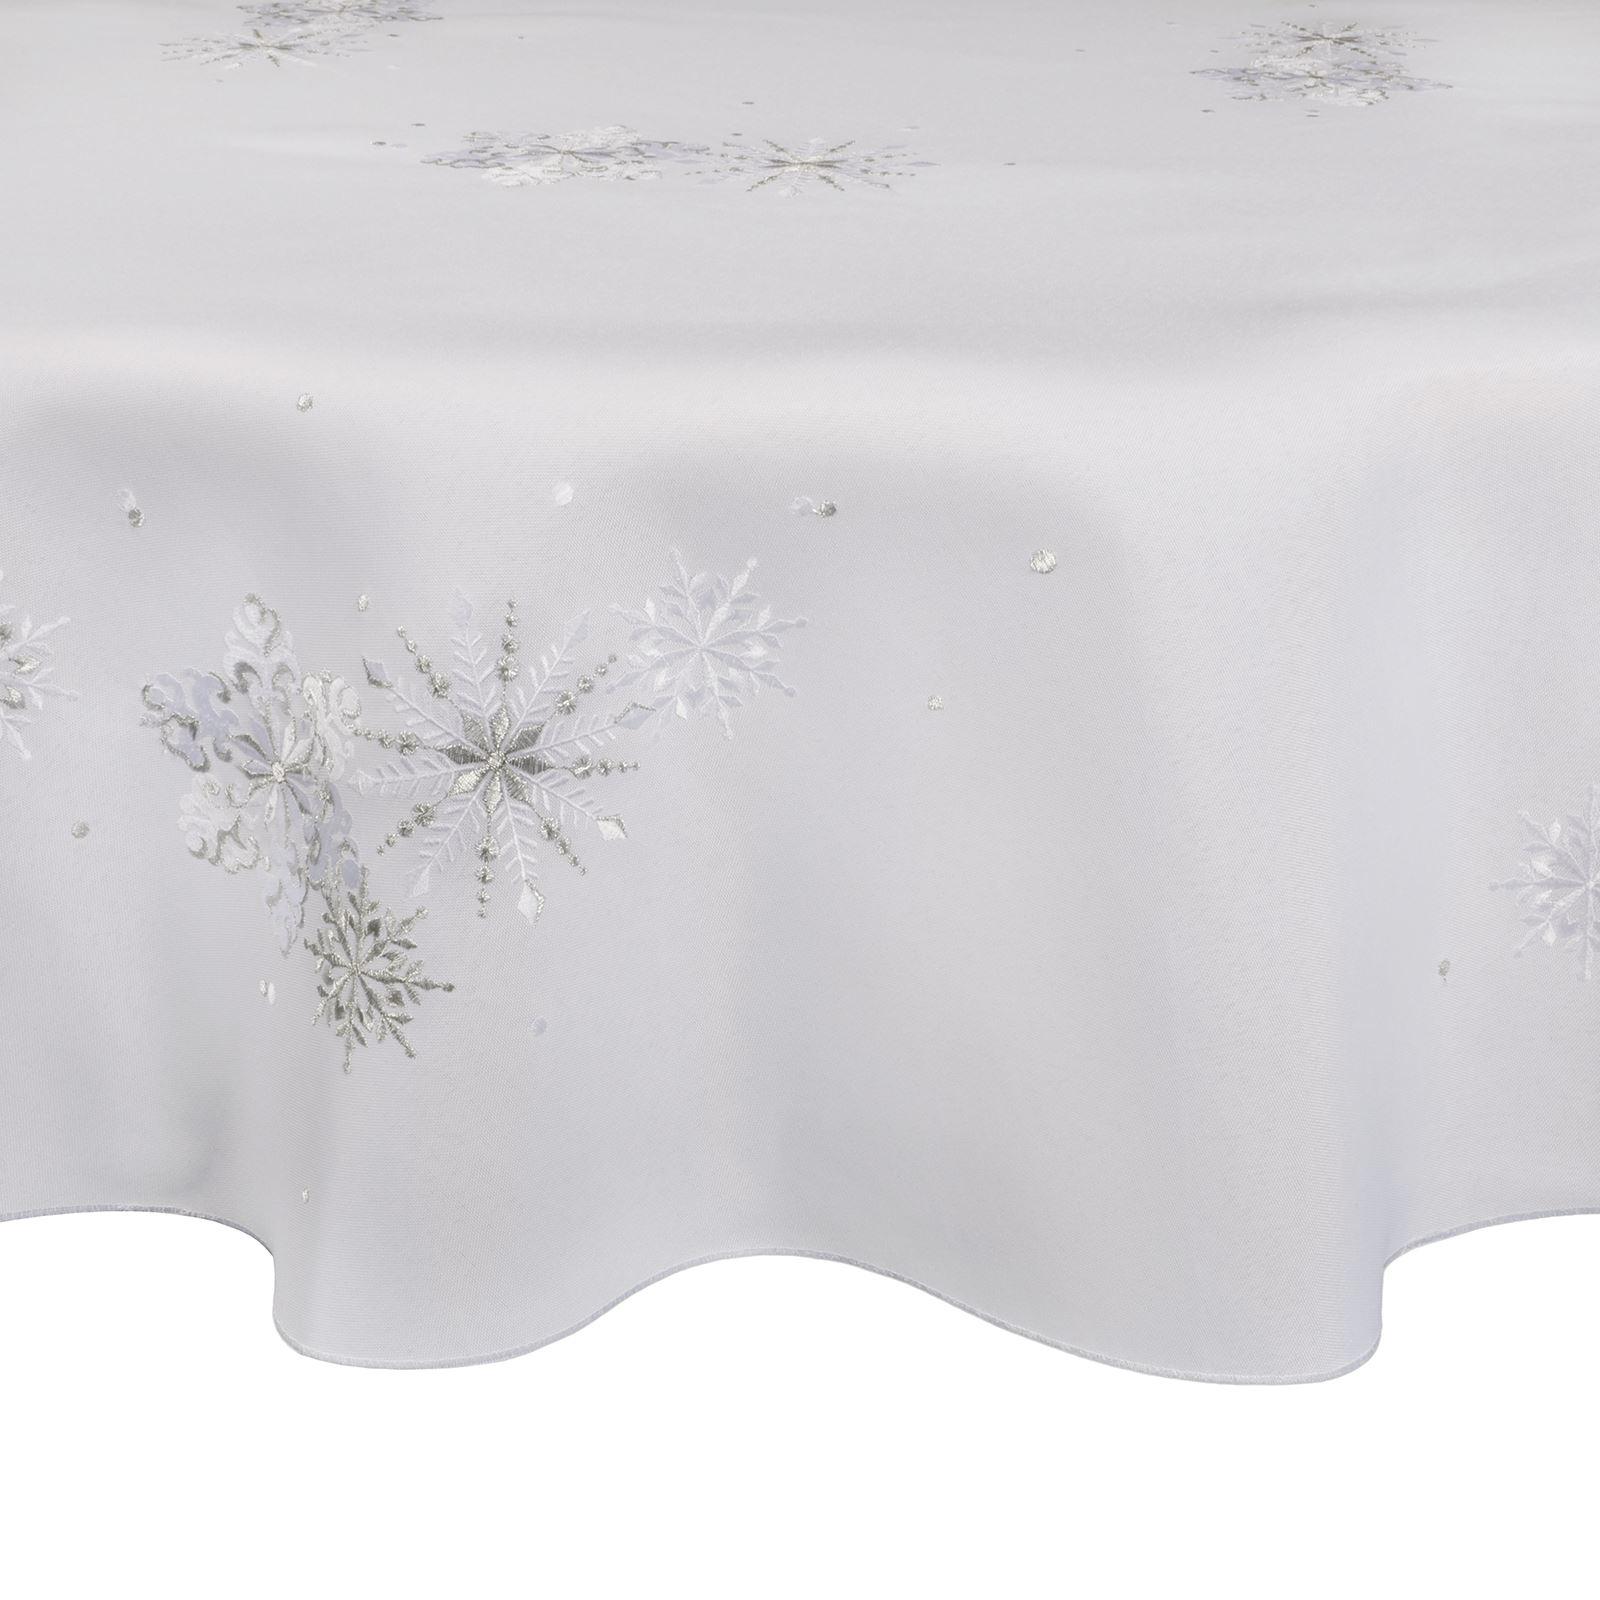 Christmas-Tablecloth-Festive-Pattern-Rectangle-Round-Fabric-Xmas-Room-Decoration Indexbild 33